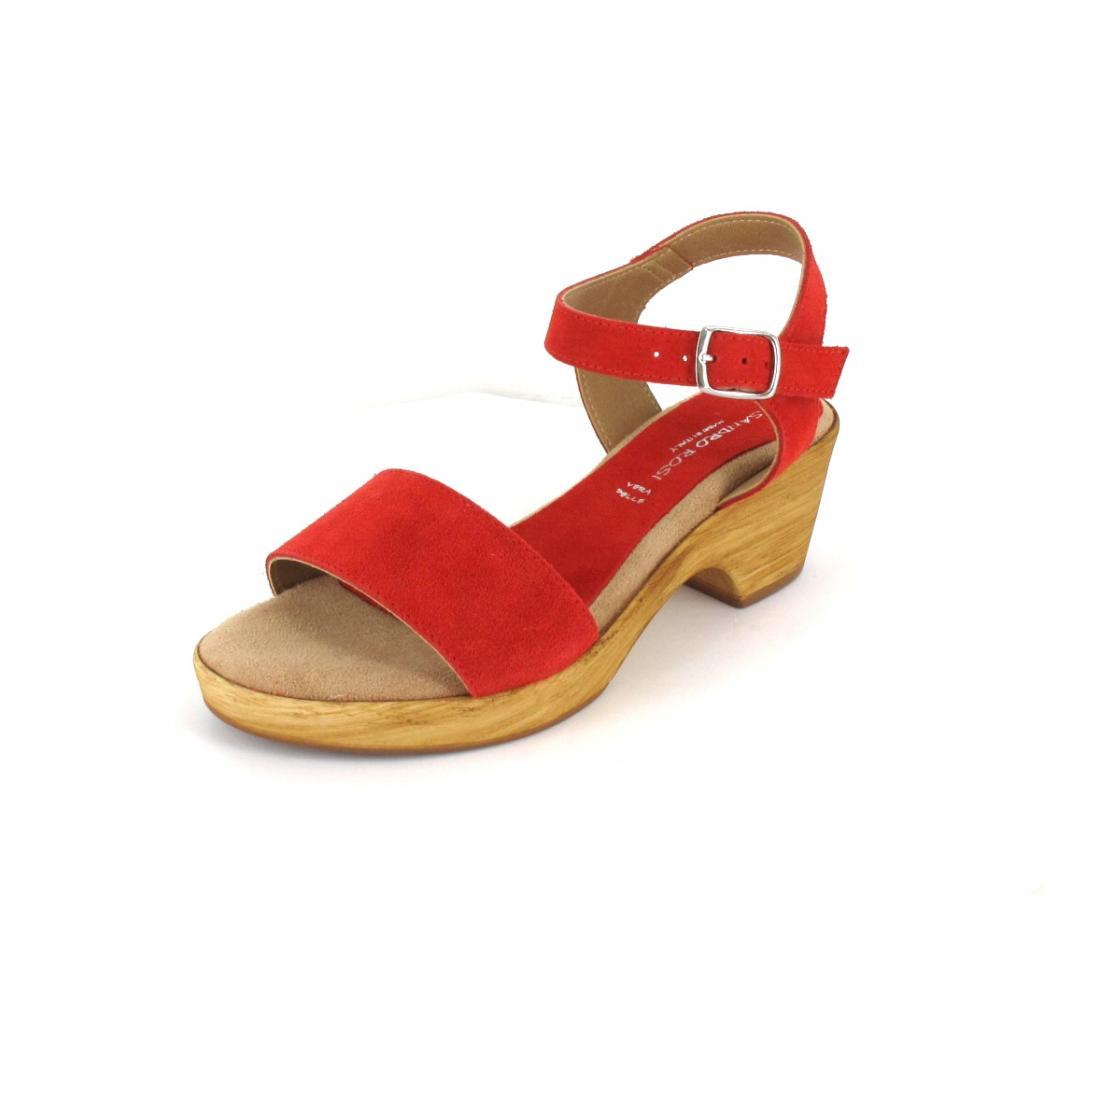 Sandy Shoes Sandale crosta scamosciata rossa